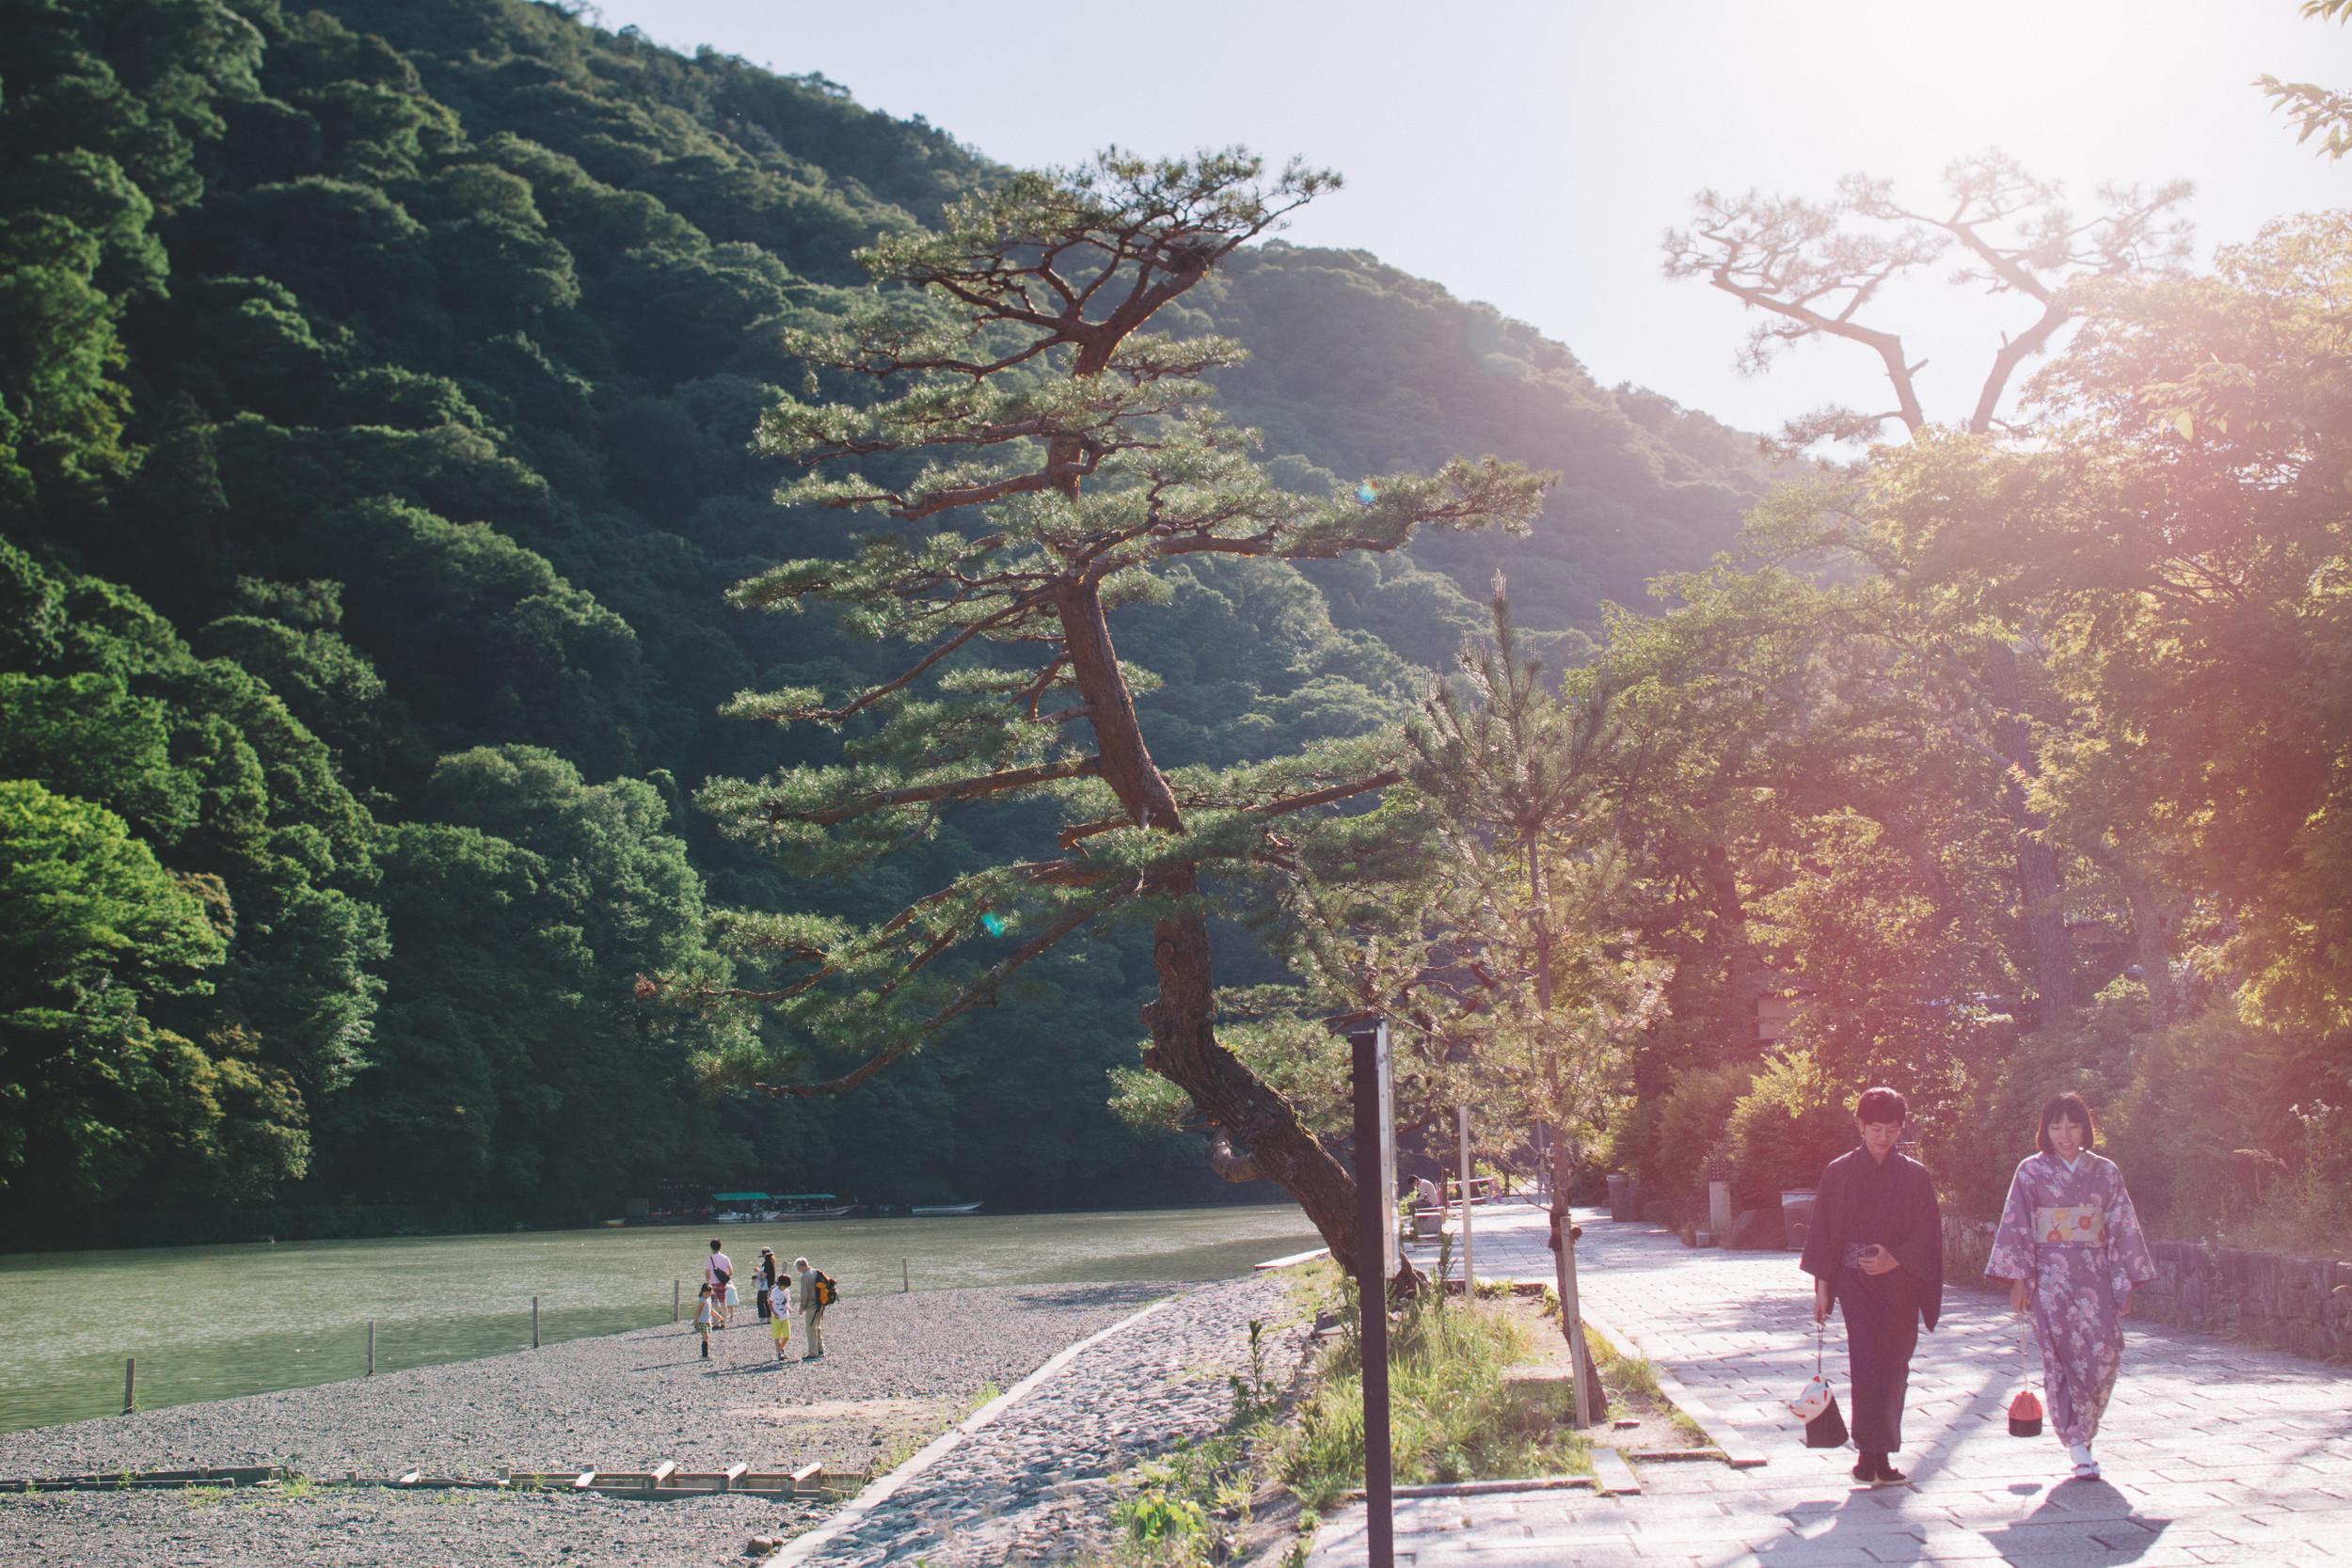 Japan, DC Photography, Dan Chern Photography, Bay Area Photography, Wedding Photography, Travel, Travel Photography, Tokyo, Kyoto, Odaiba, Osaka, Bamboo Grove, Bamboo, Japanese People